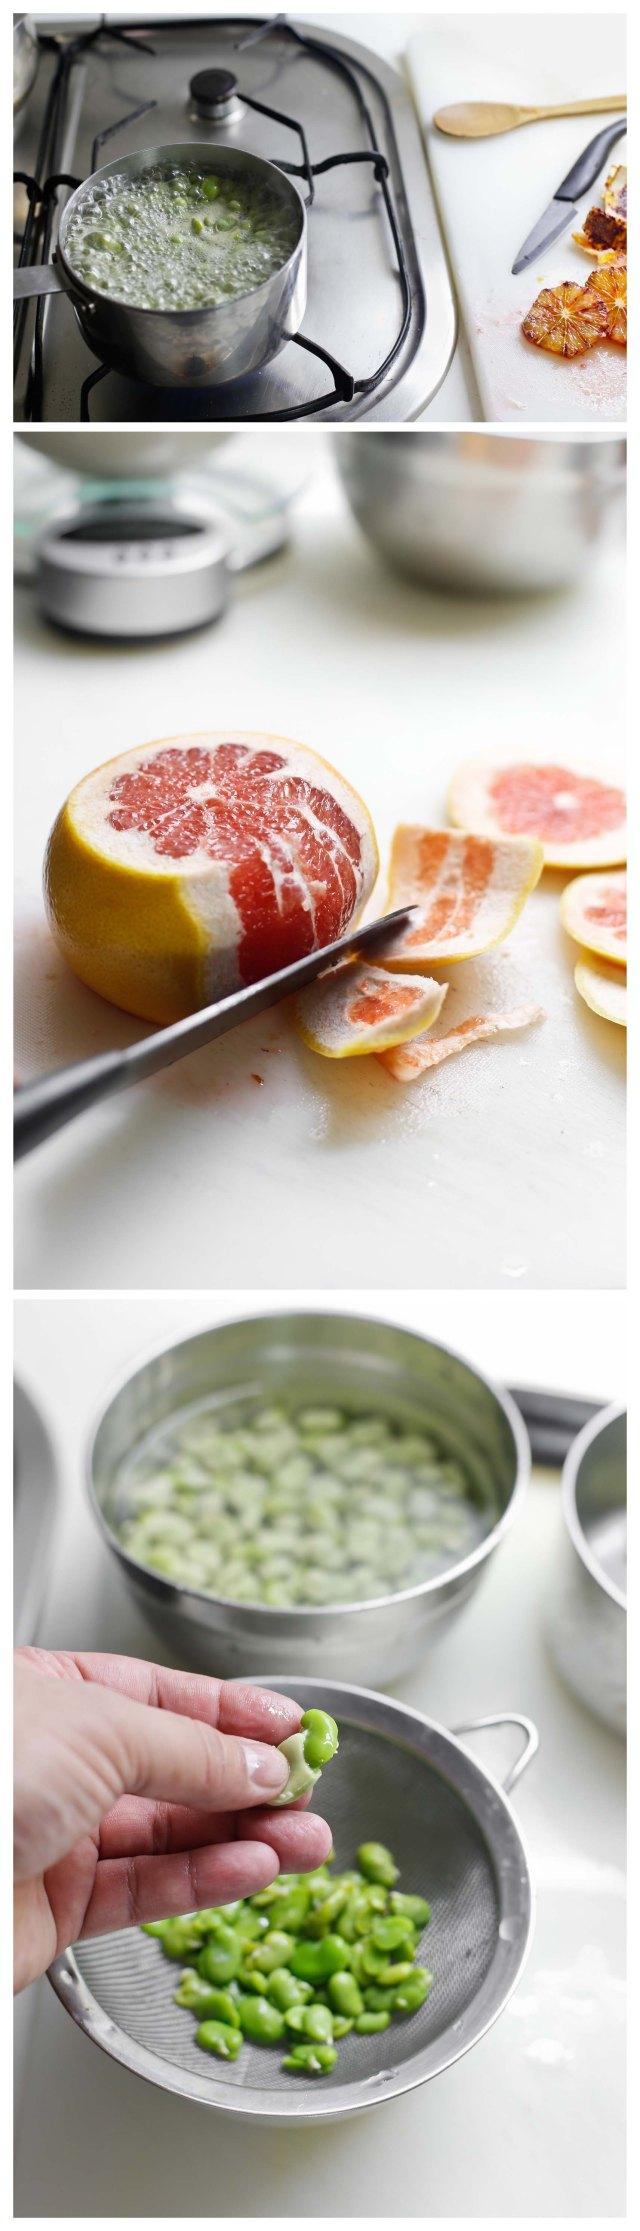 Ensalada-habitas-citricos